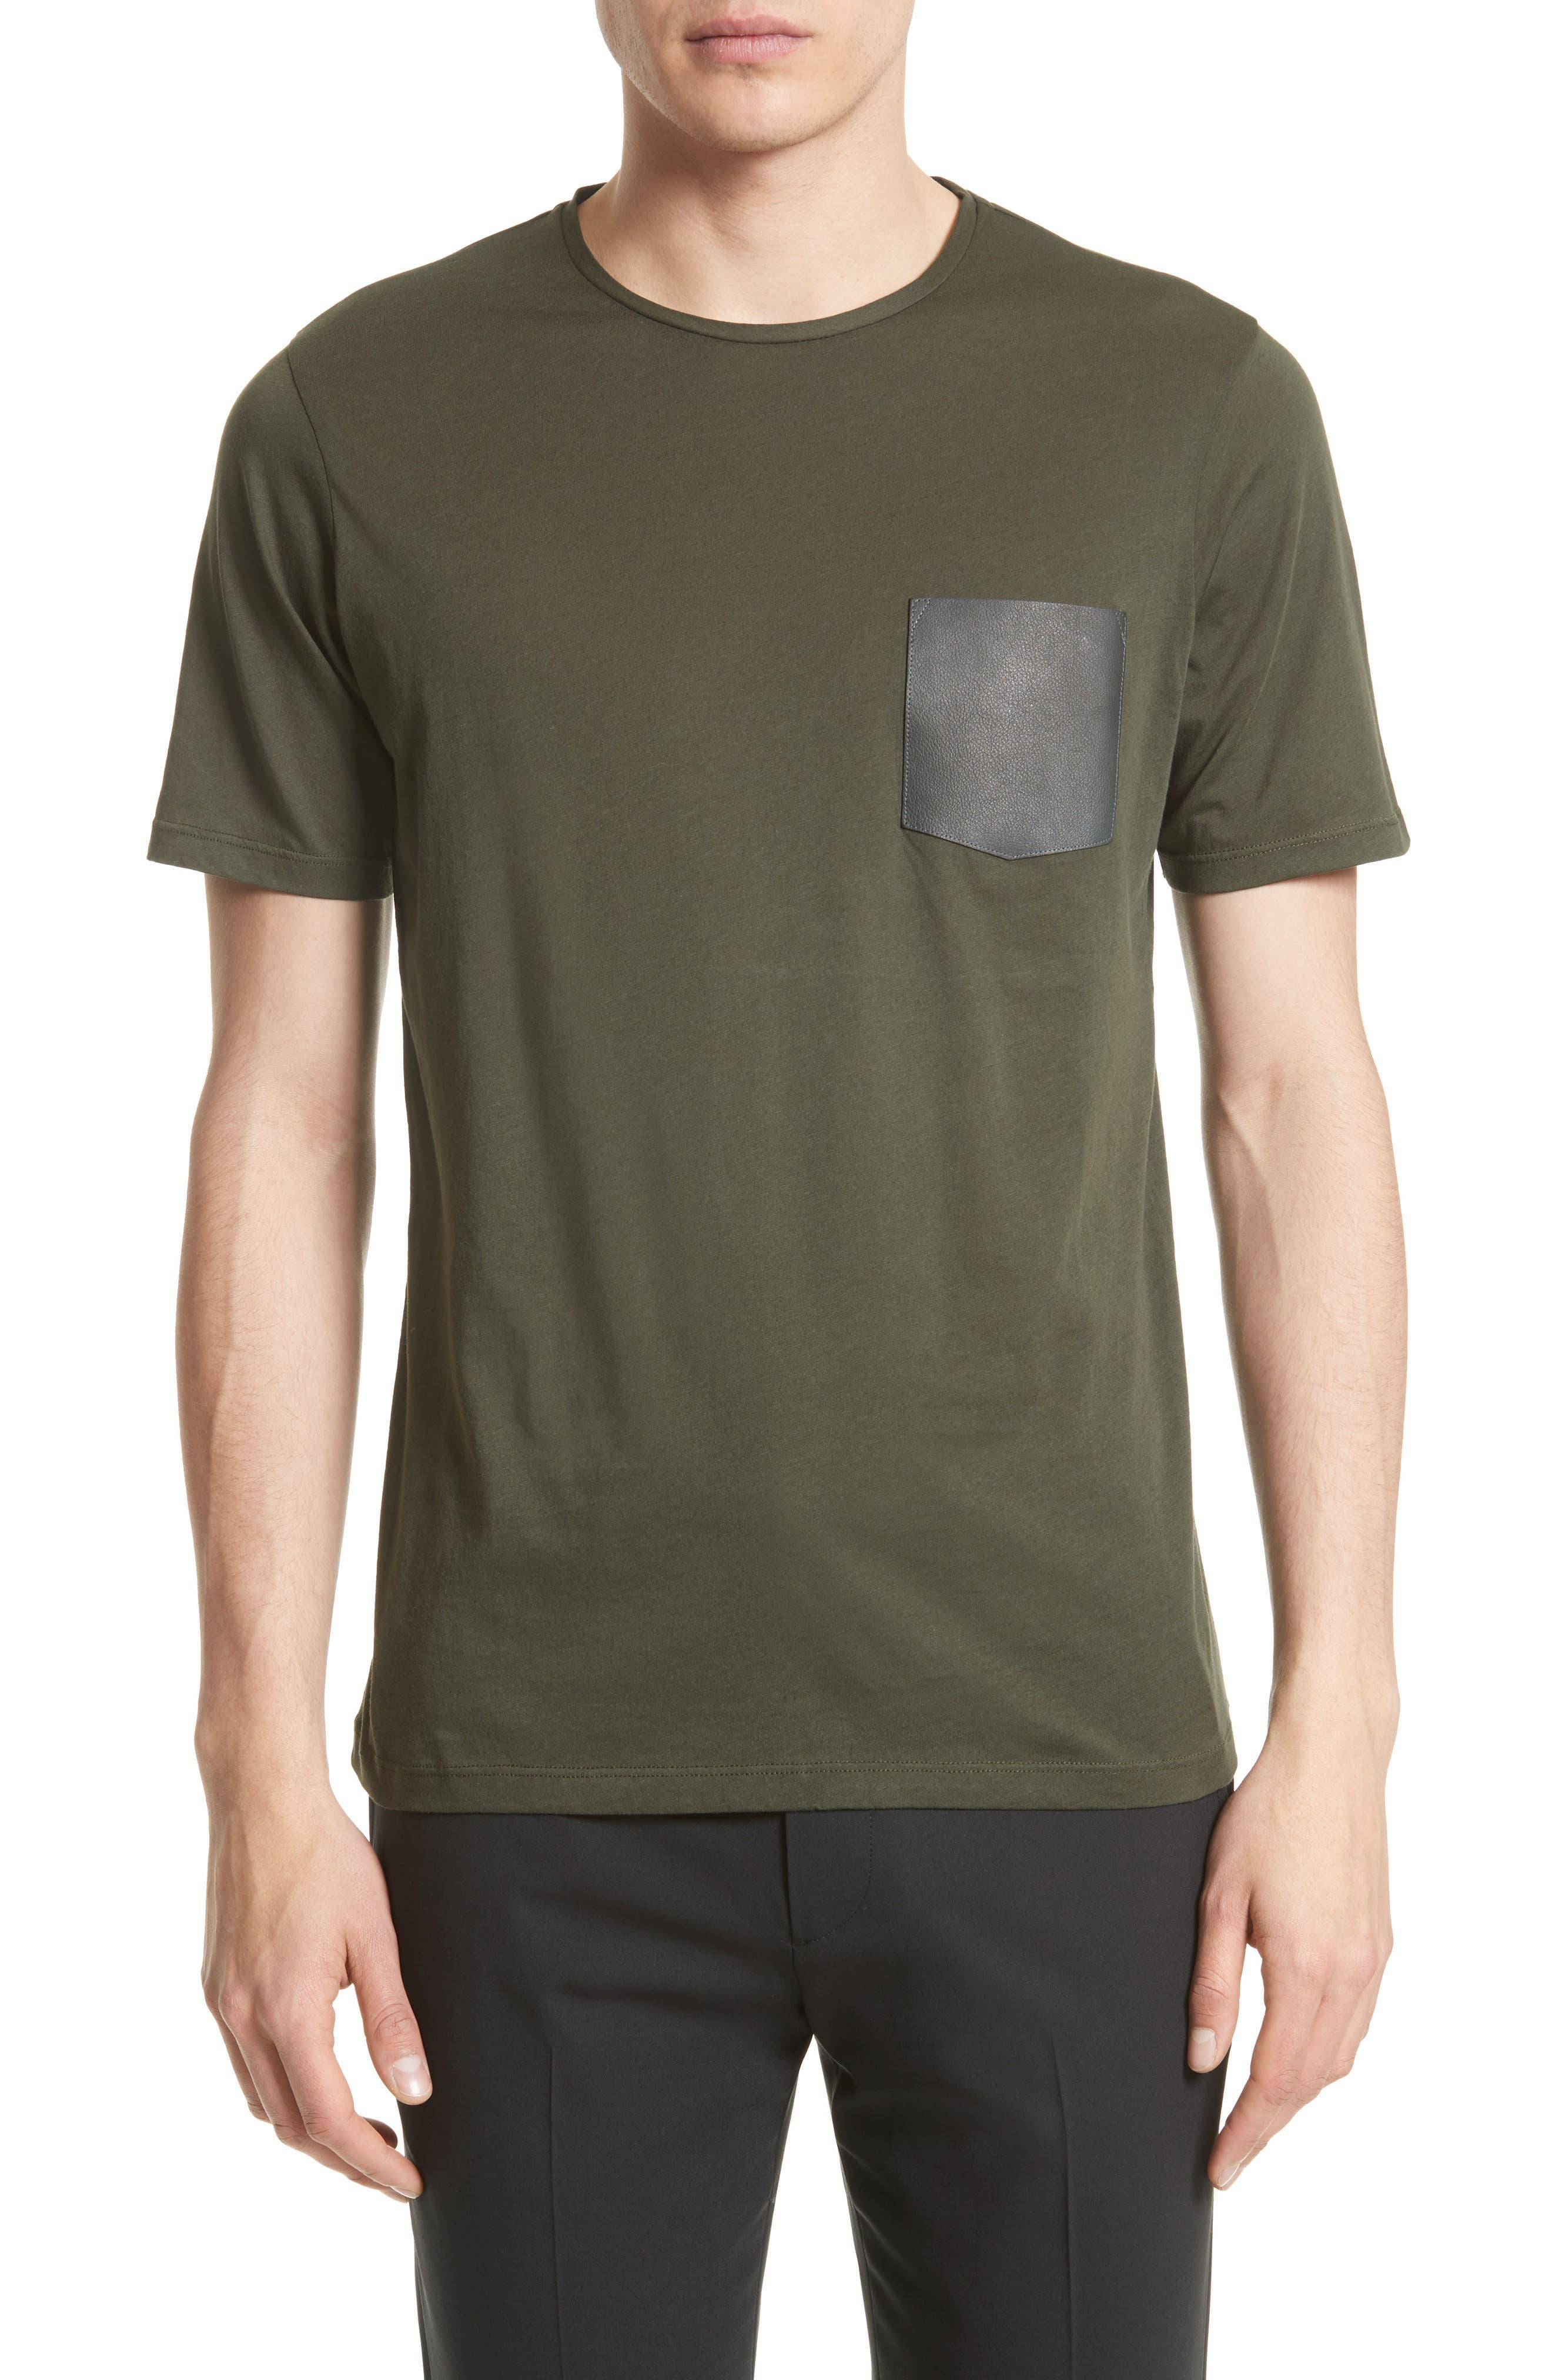 Alternate Image 1 Selected - The Kooples Leather Pocket T-Shirt